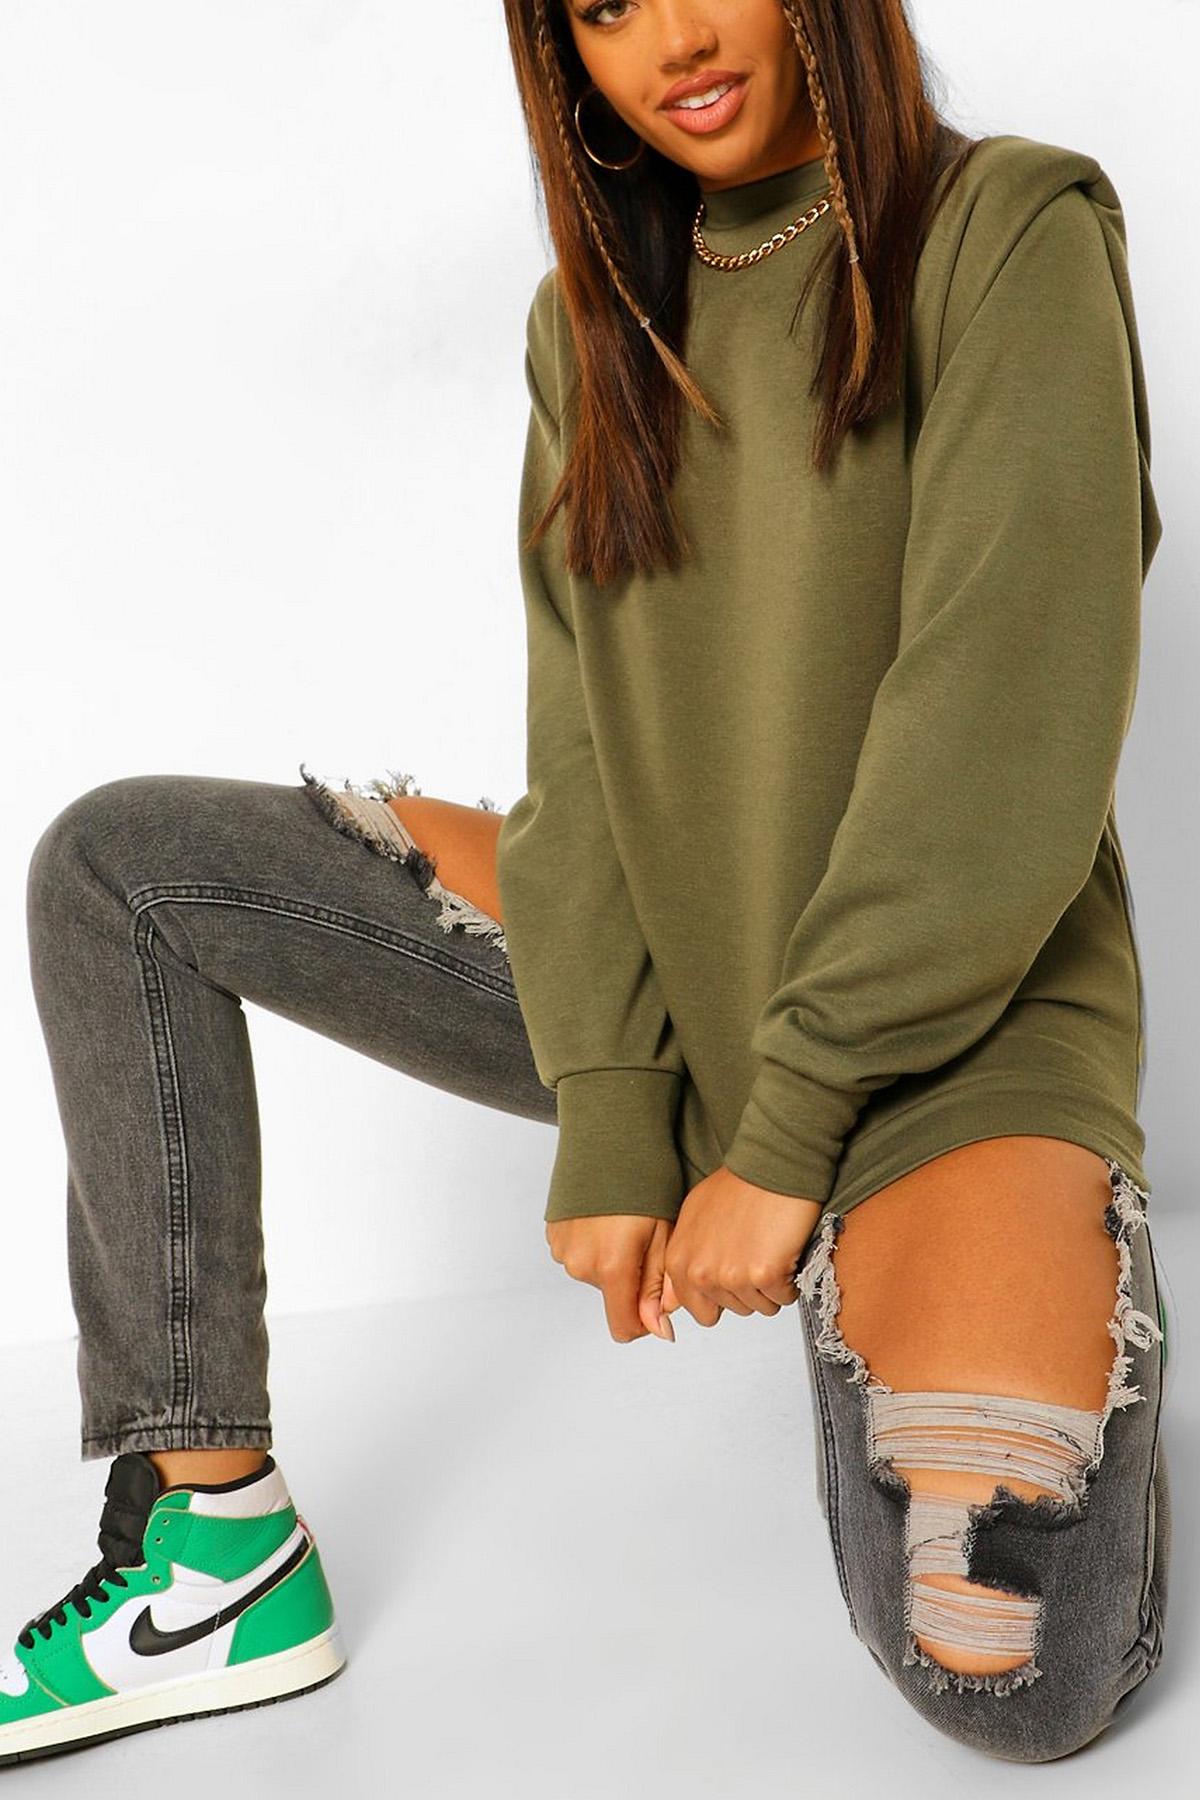 XHAN - Haki Vatkalı Sweatshirt 1KXK8-44260-09